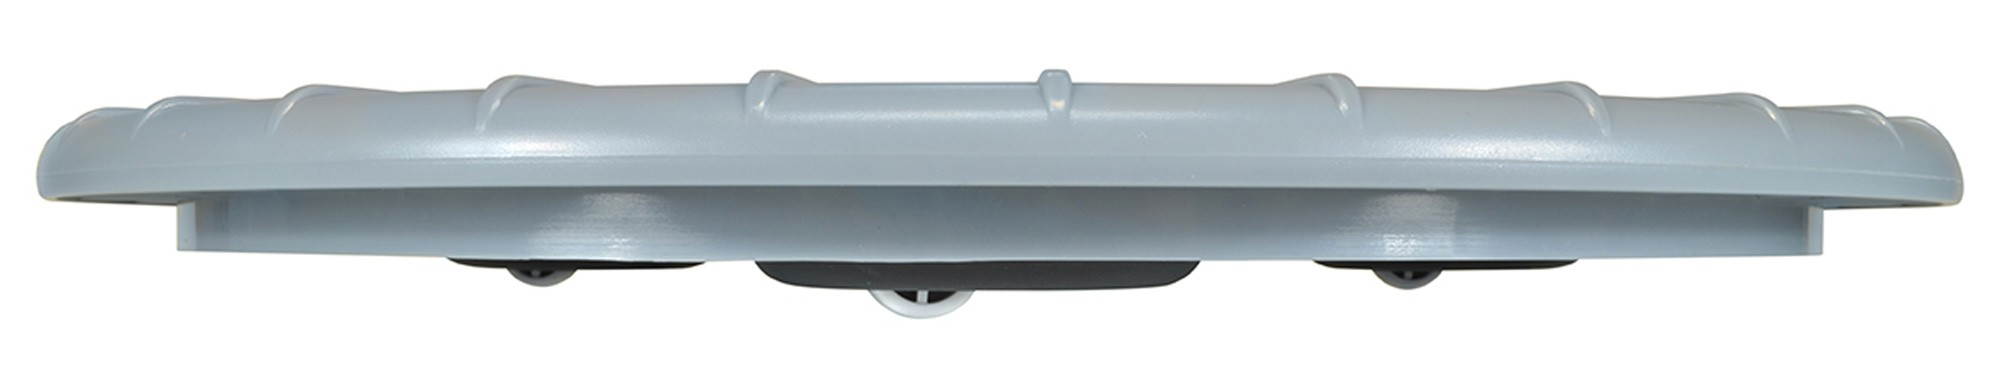 Wagner Pflanzenroller Multi Roller Ultraflat flach Ø30cm silber-alu Bild 2